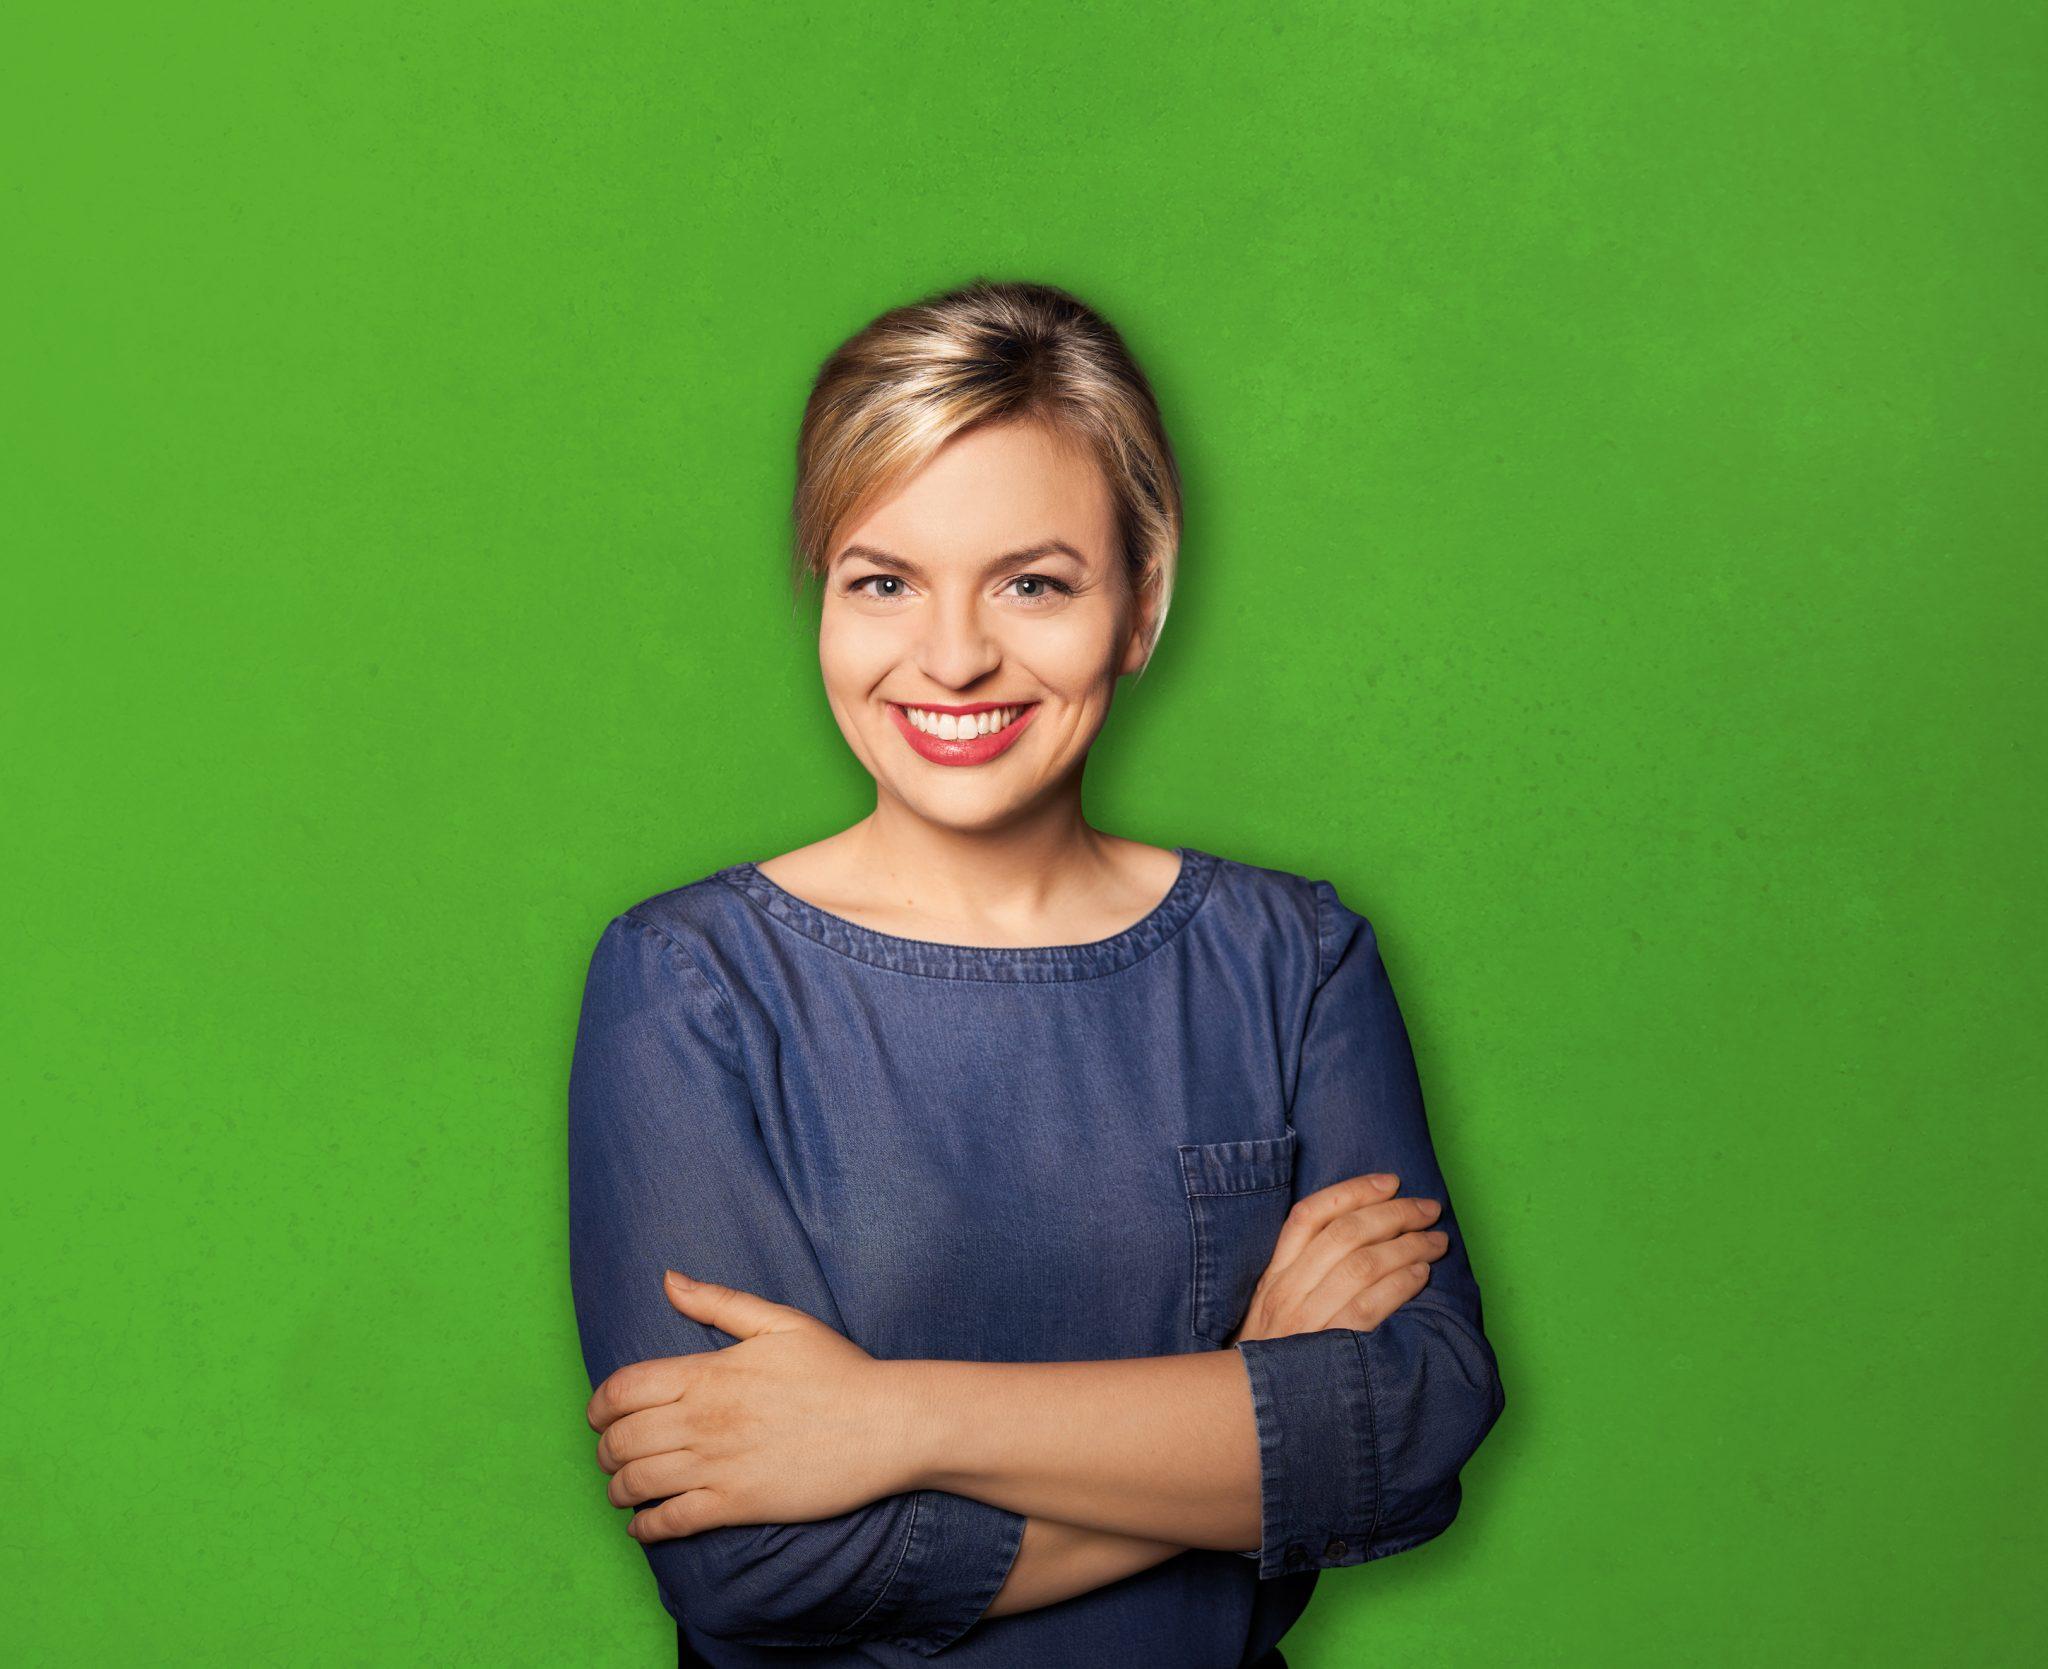 Daten-Websites für Konservative Julianne moore Dating-Geschichte